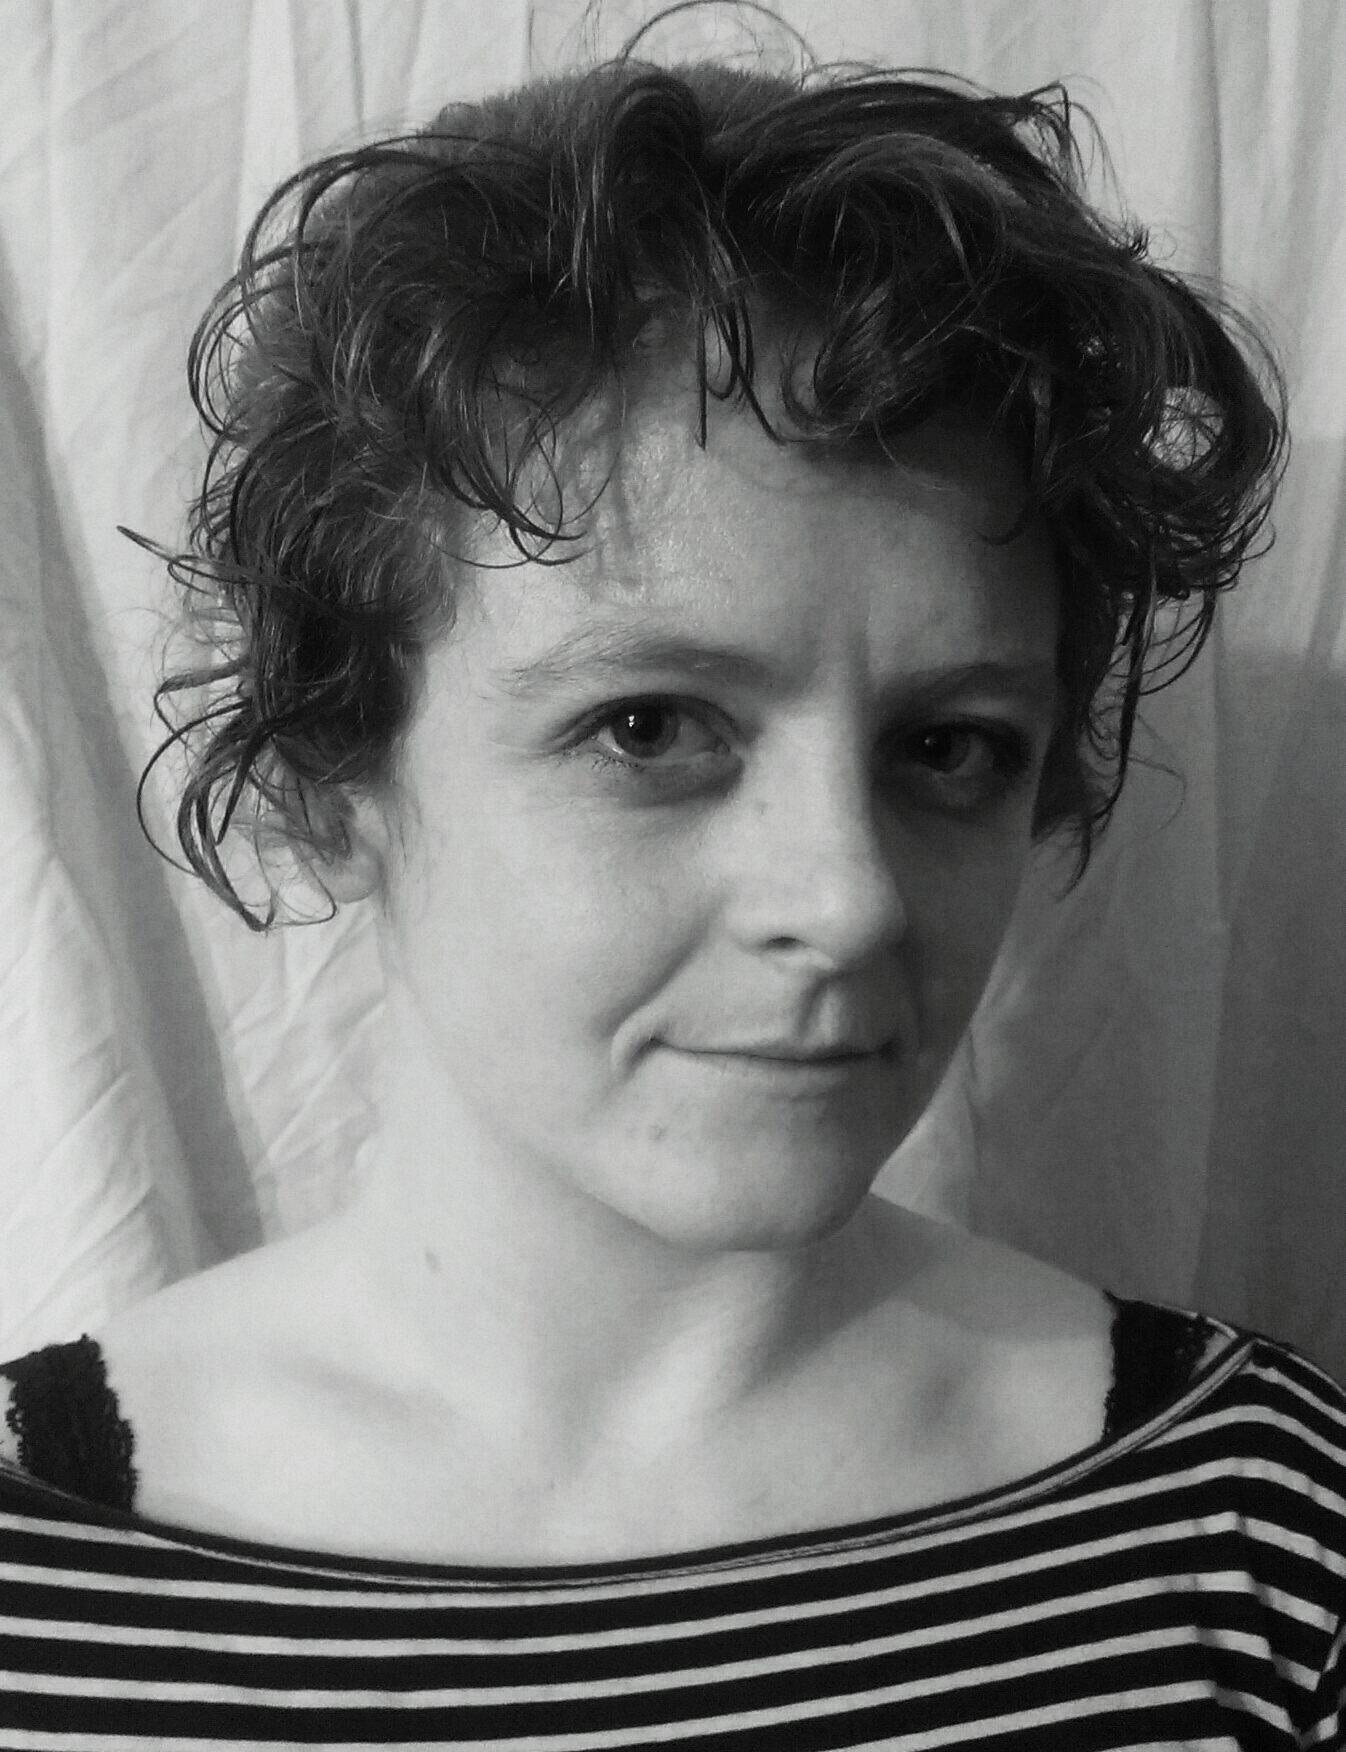 Emma O'Grady - Production Manager